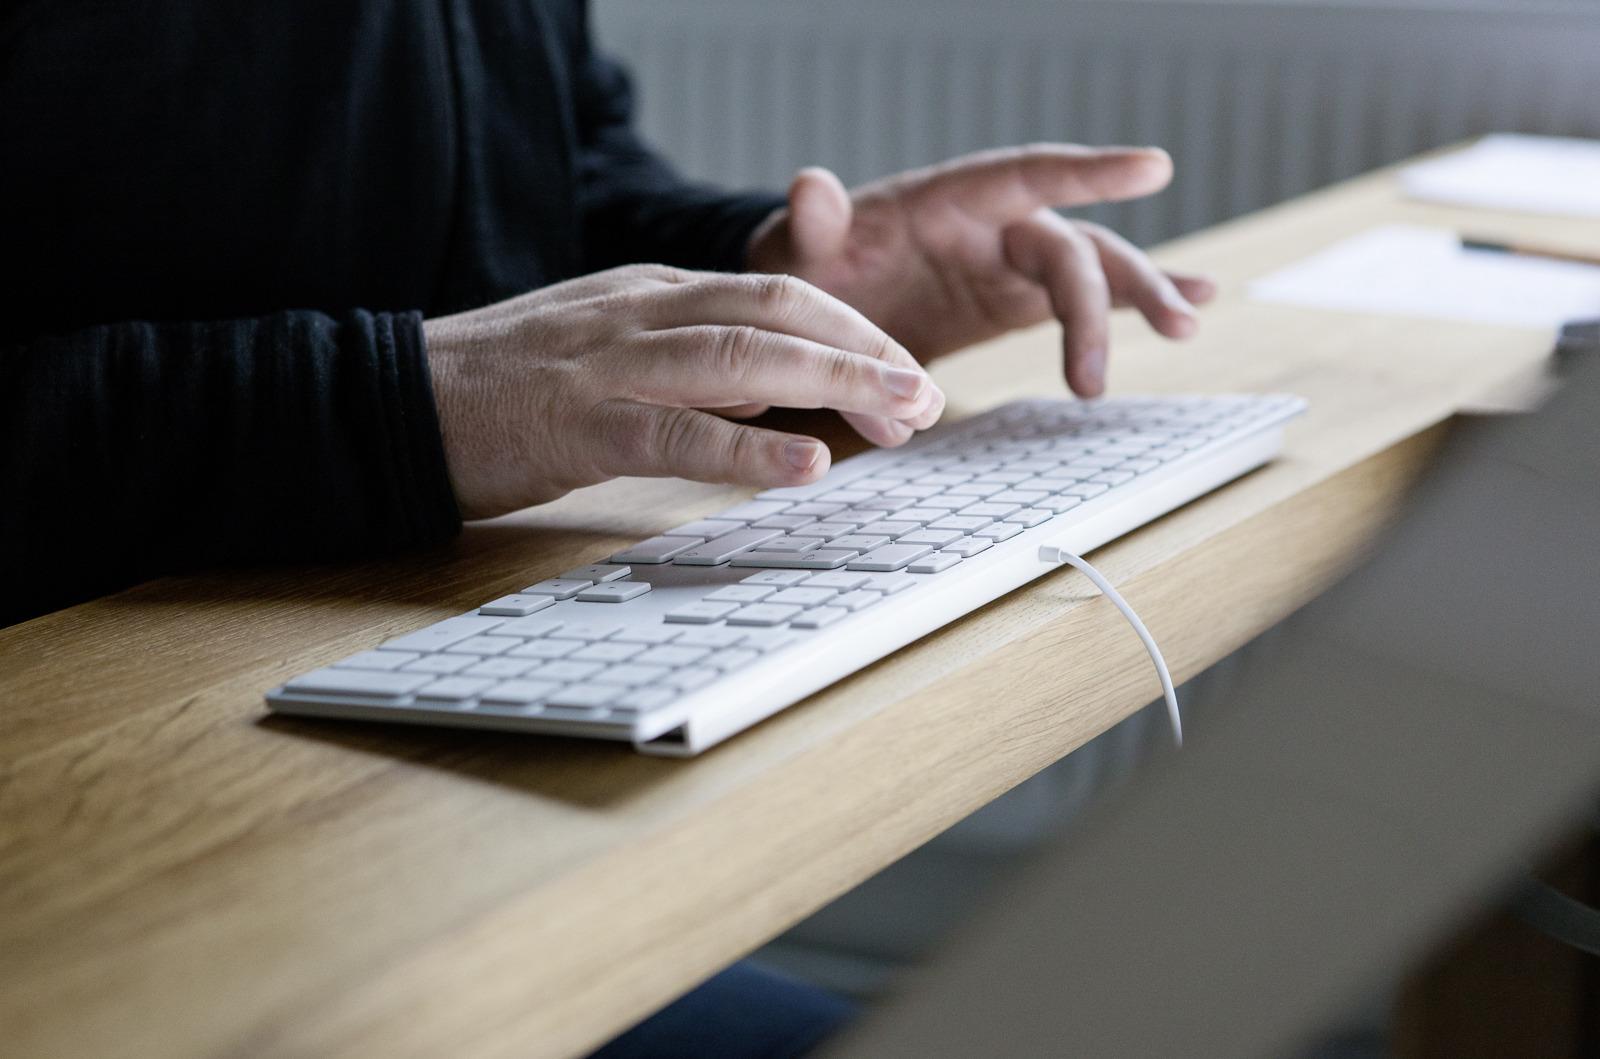 tastatur-tippen